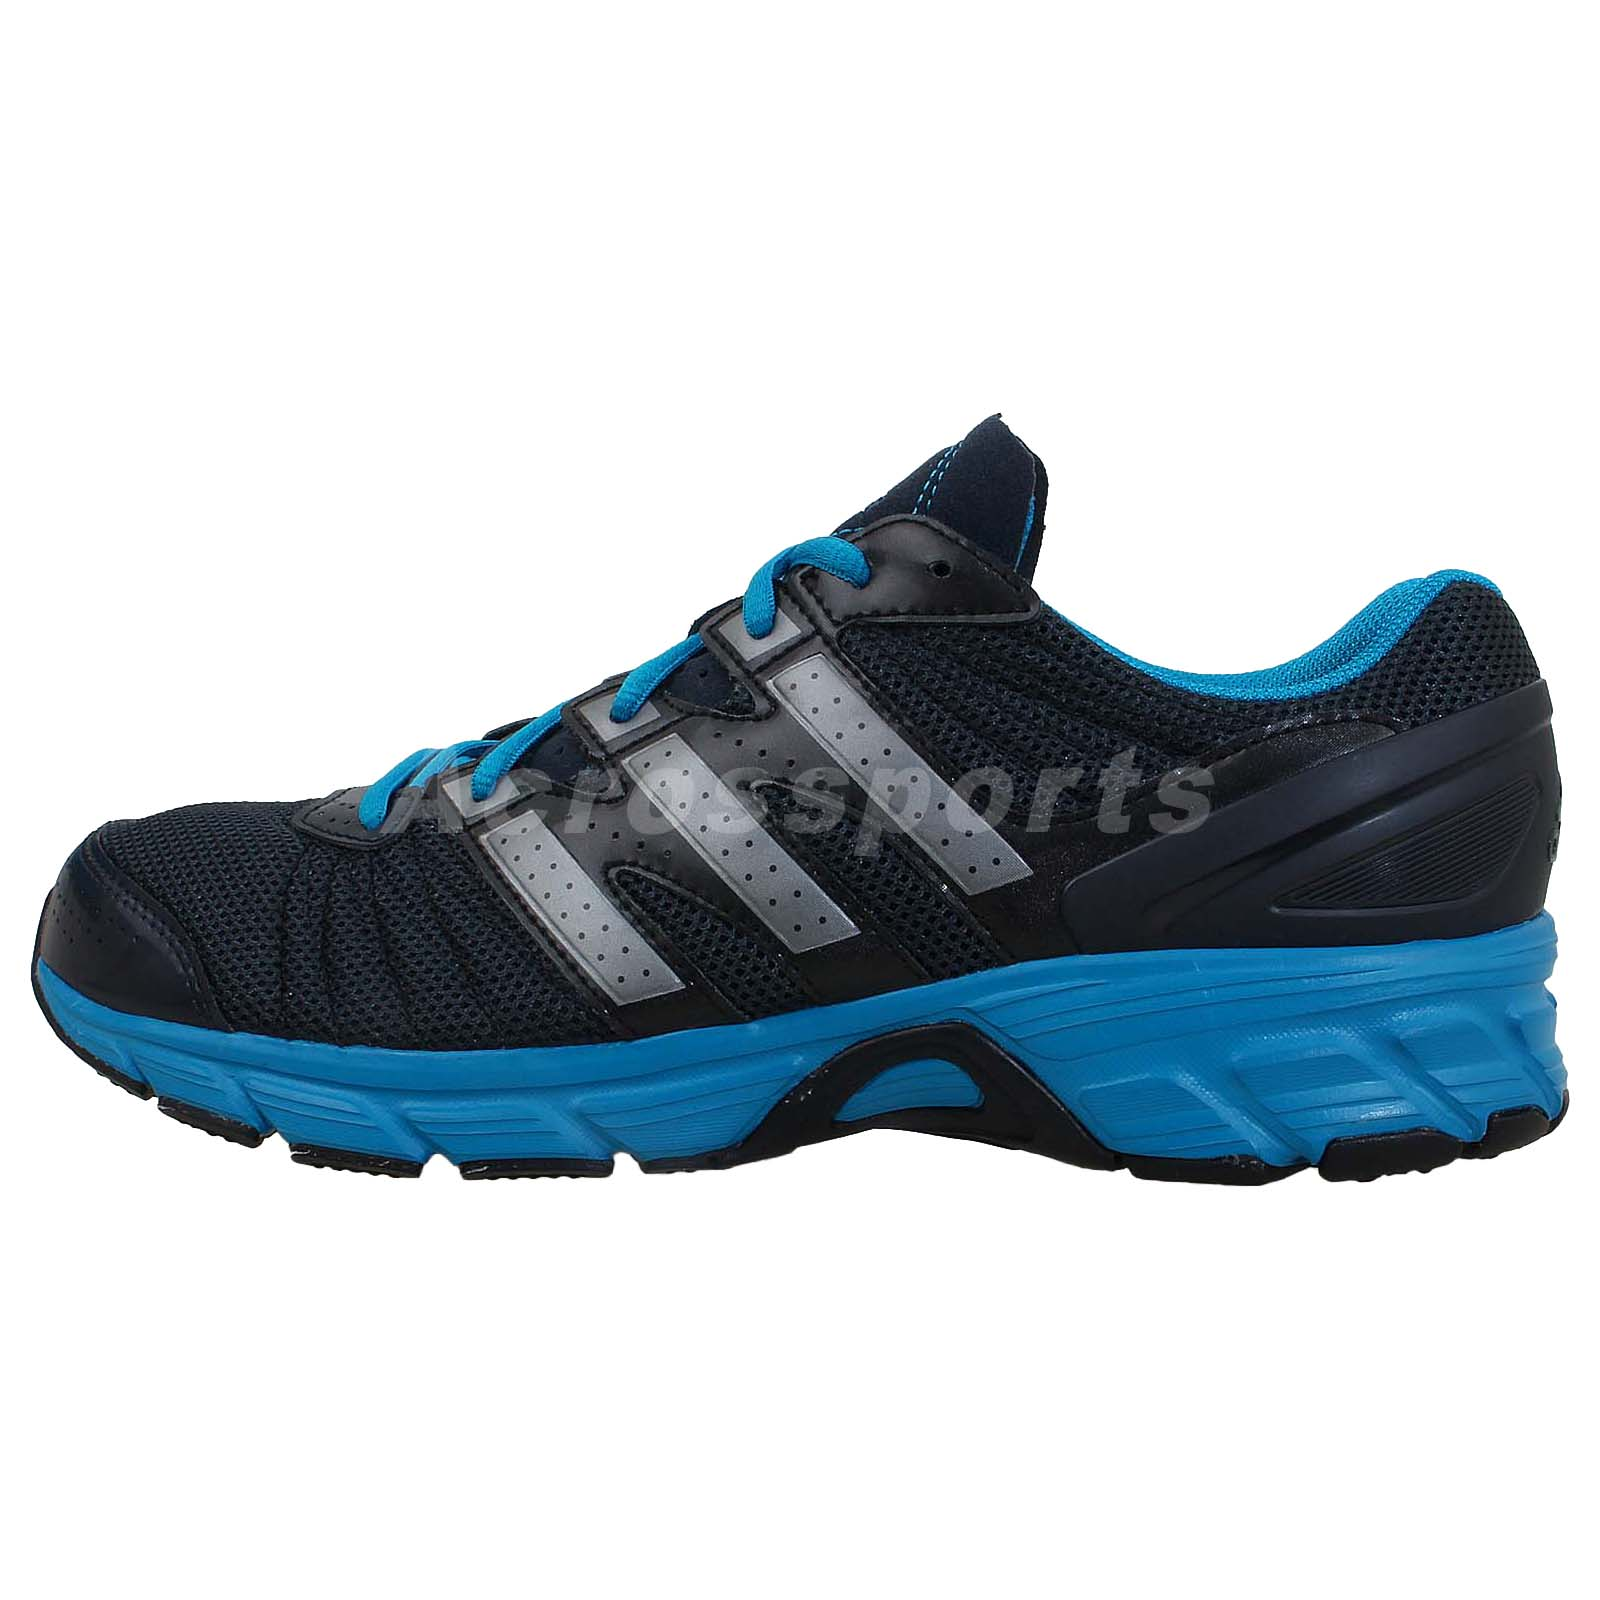 adidas roadmace m black blue 2014 mens running shoes